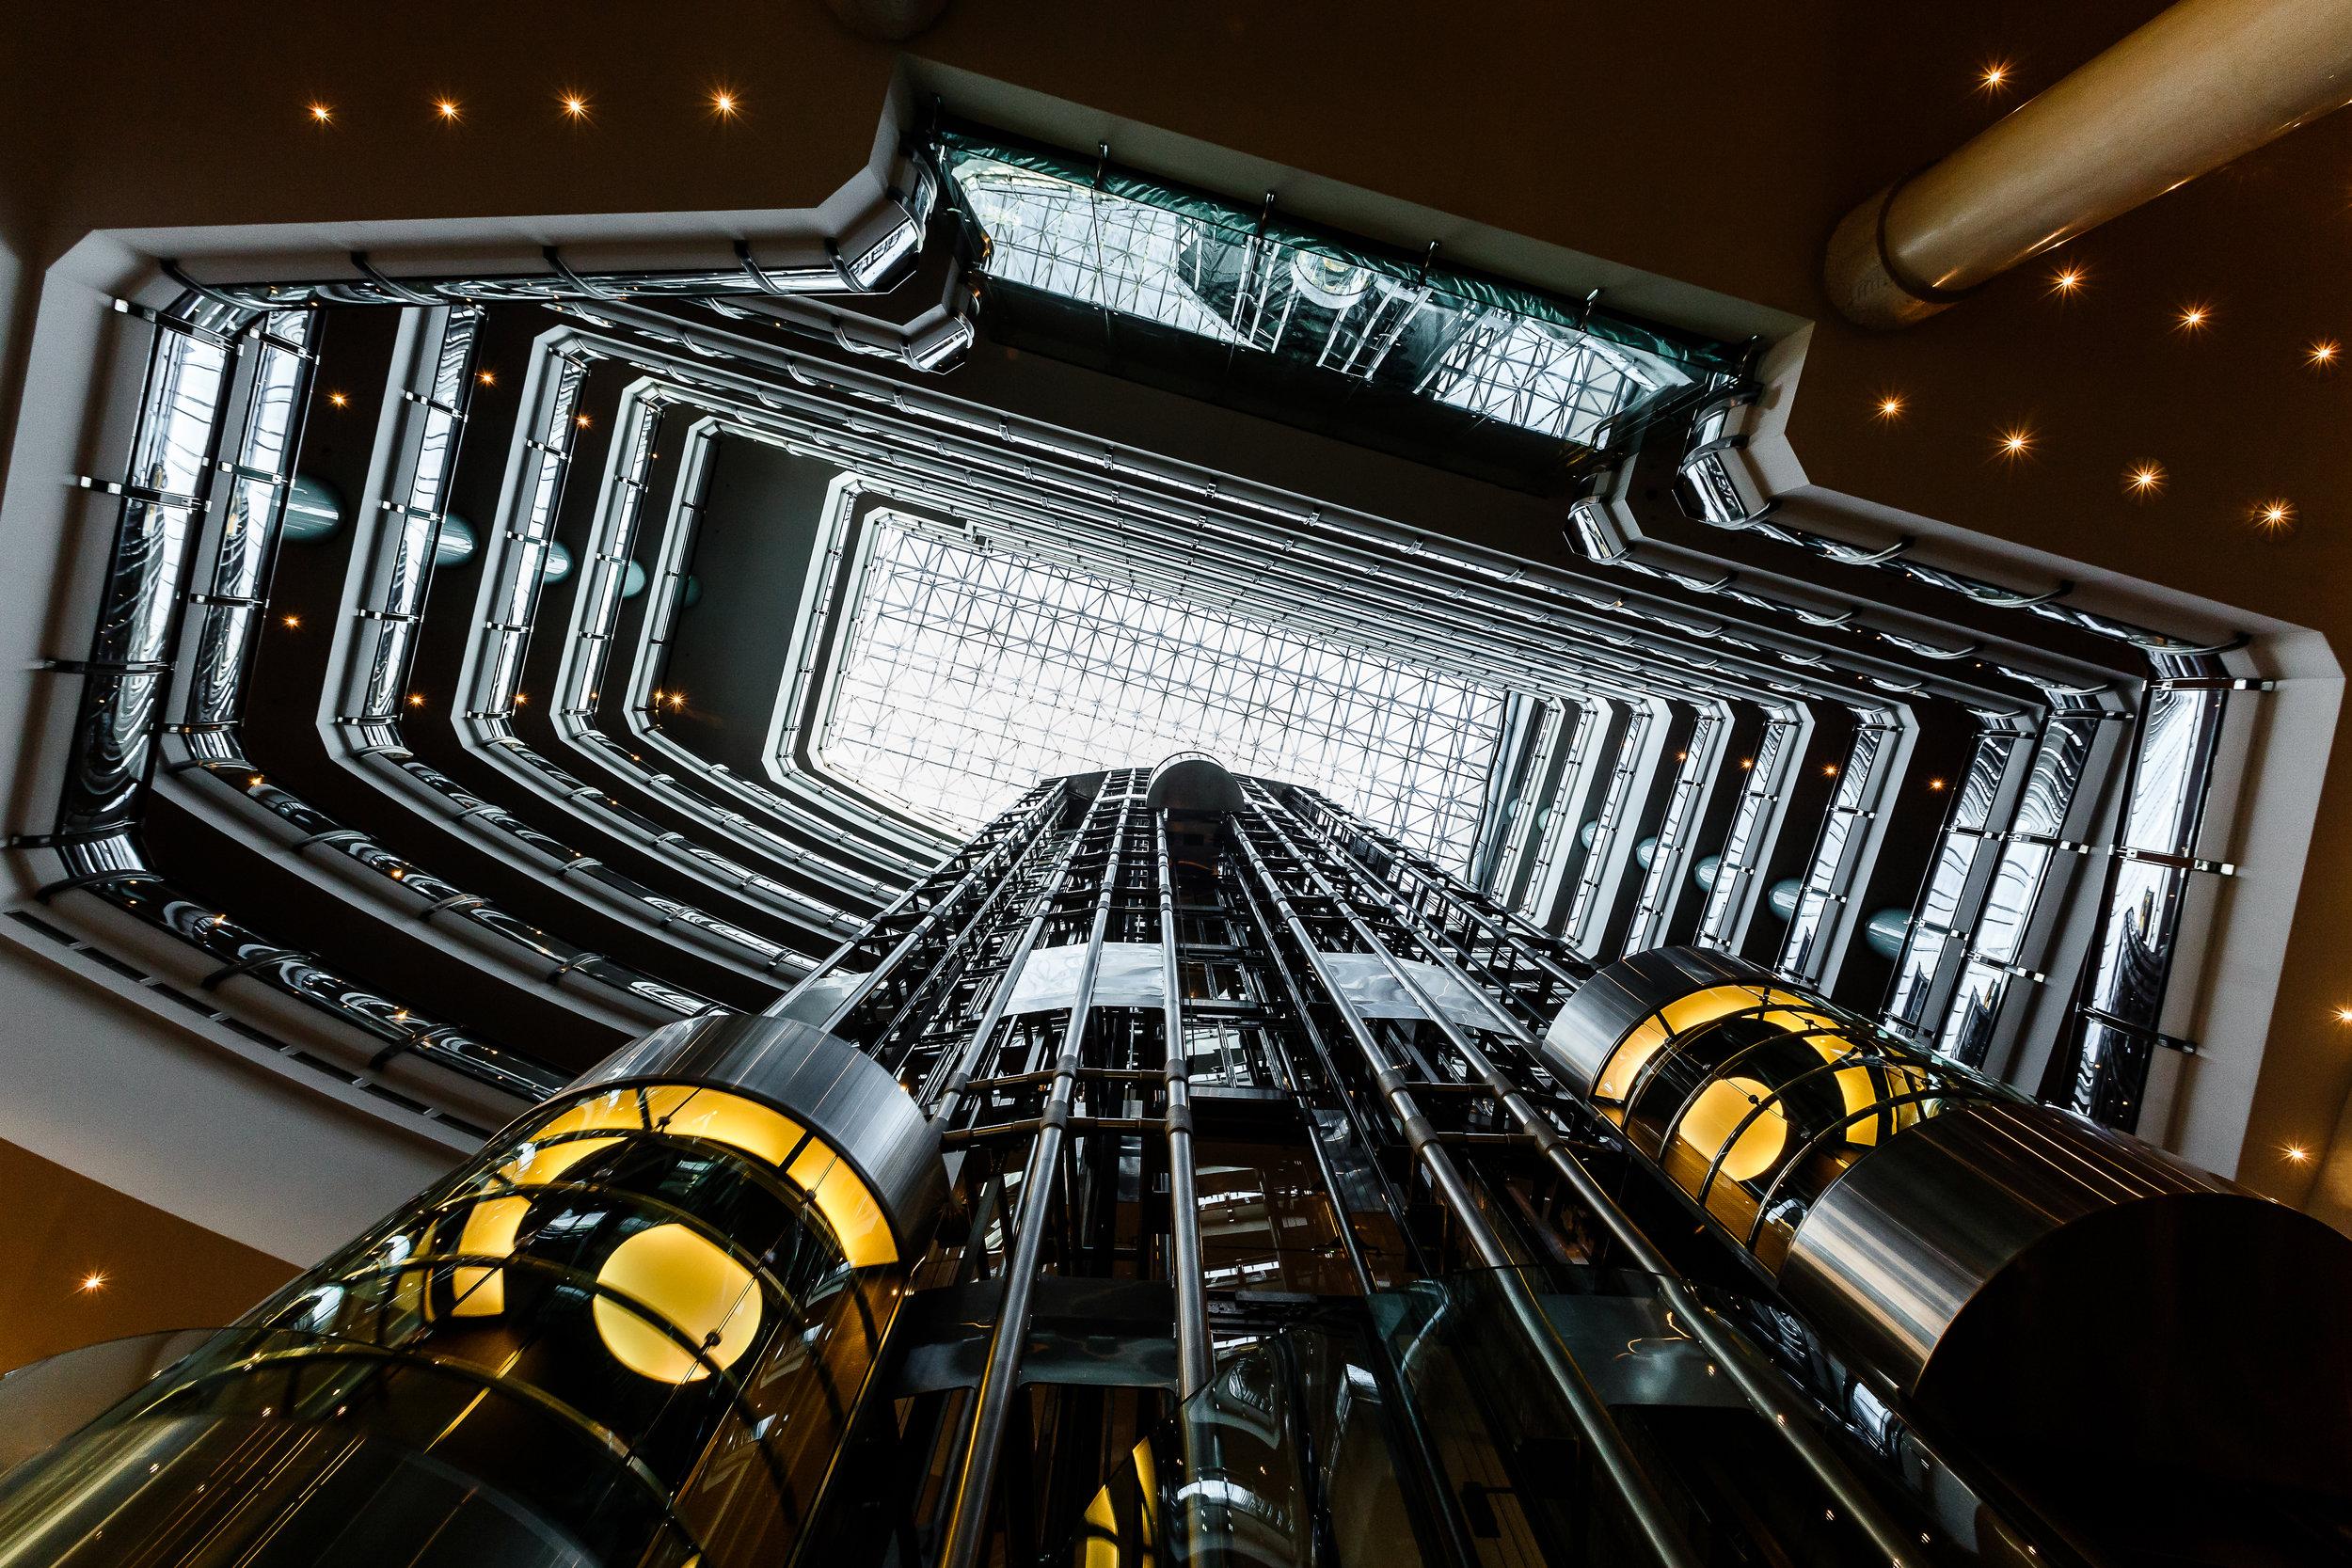 Ararat-Park-Hyatt-Moscow-Atrium-Elevators.jpg